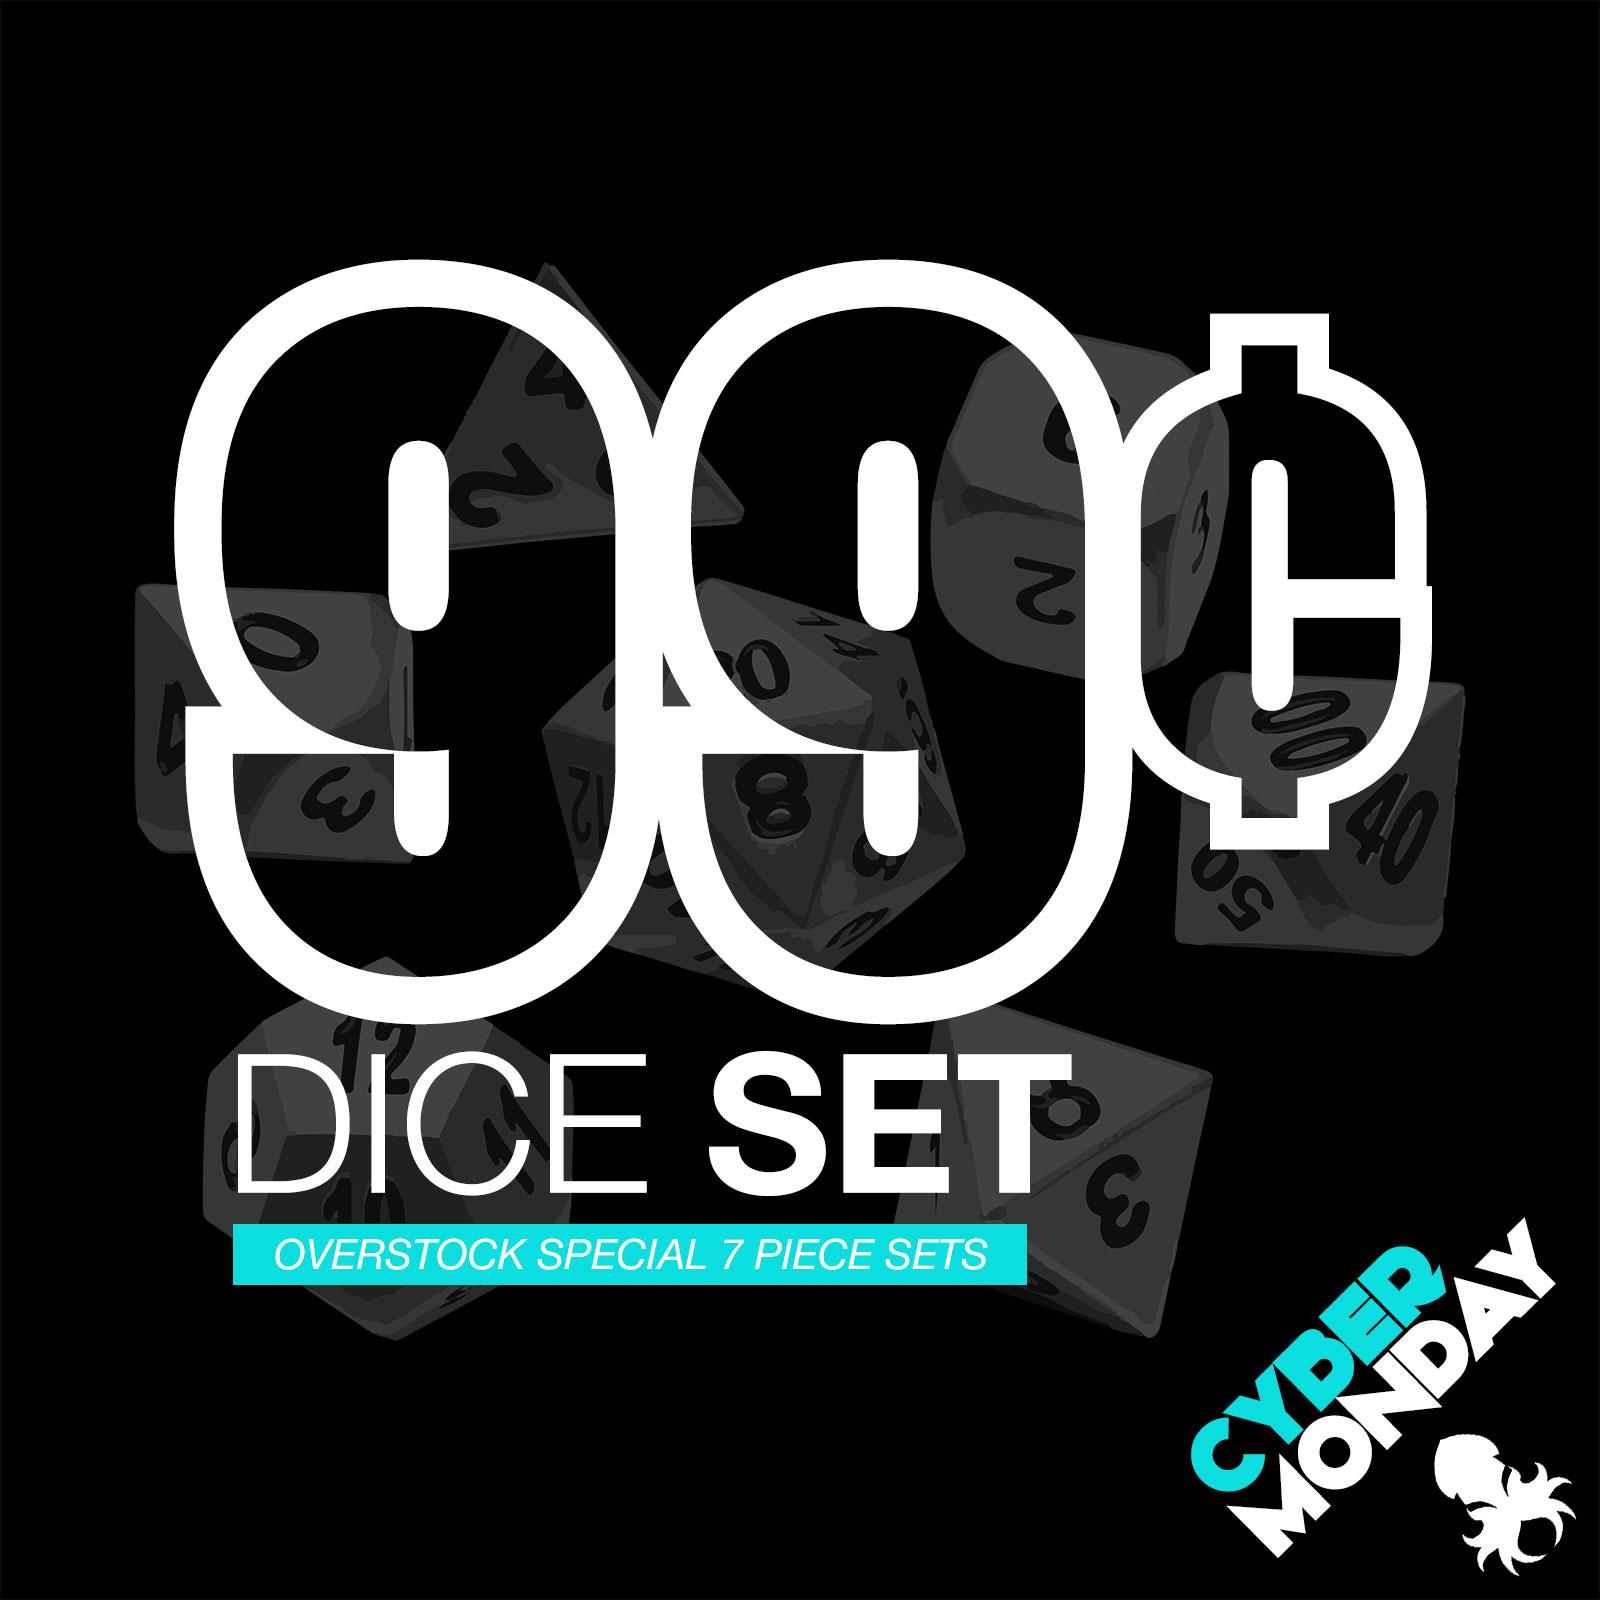 99-cent-dice-set.jpg